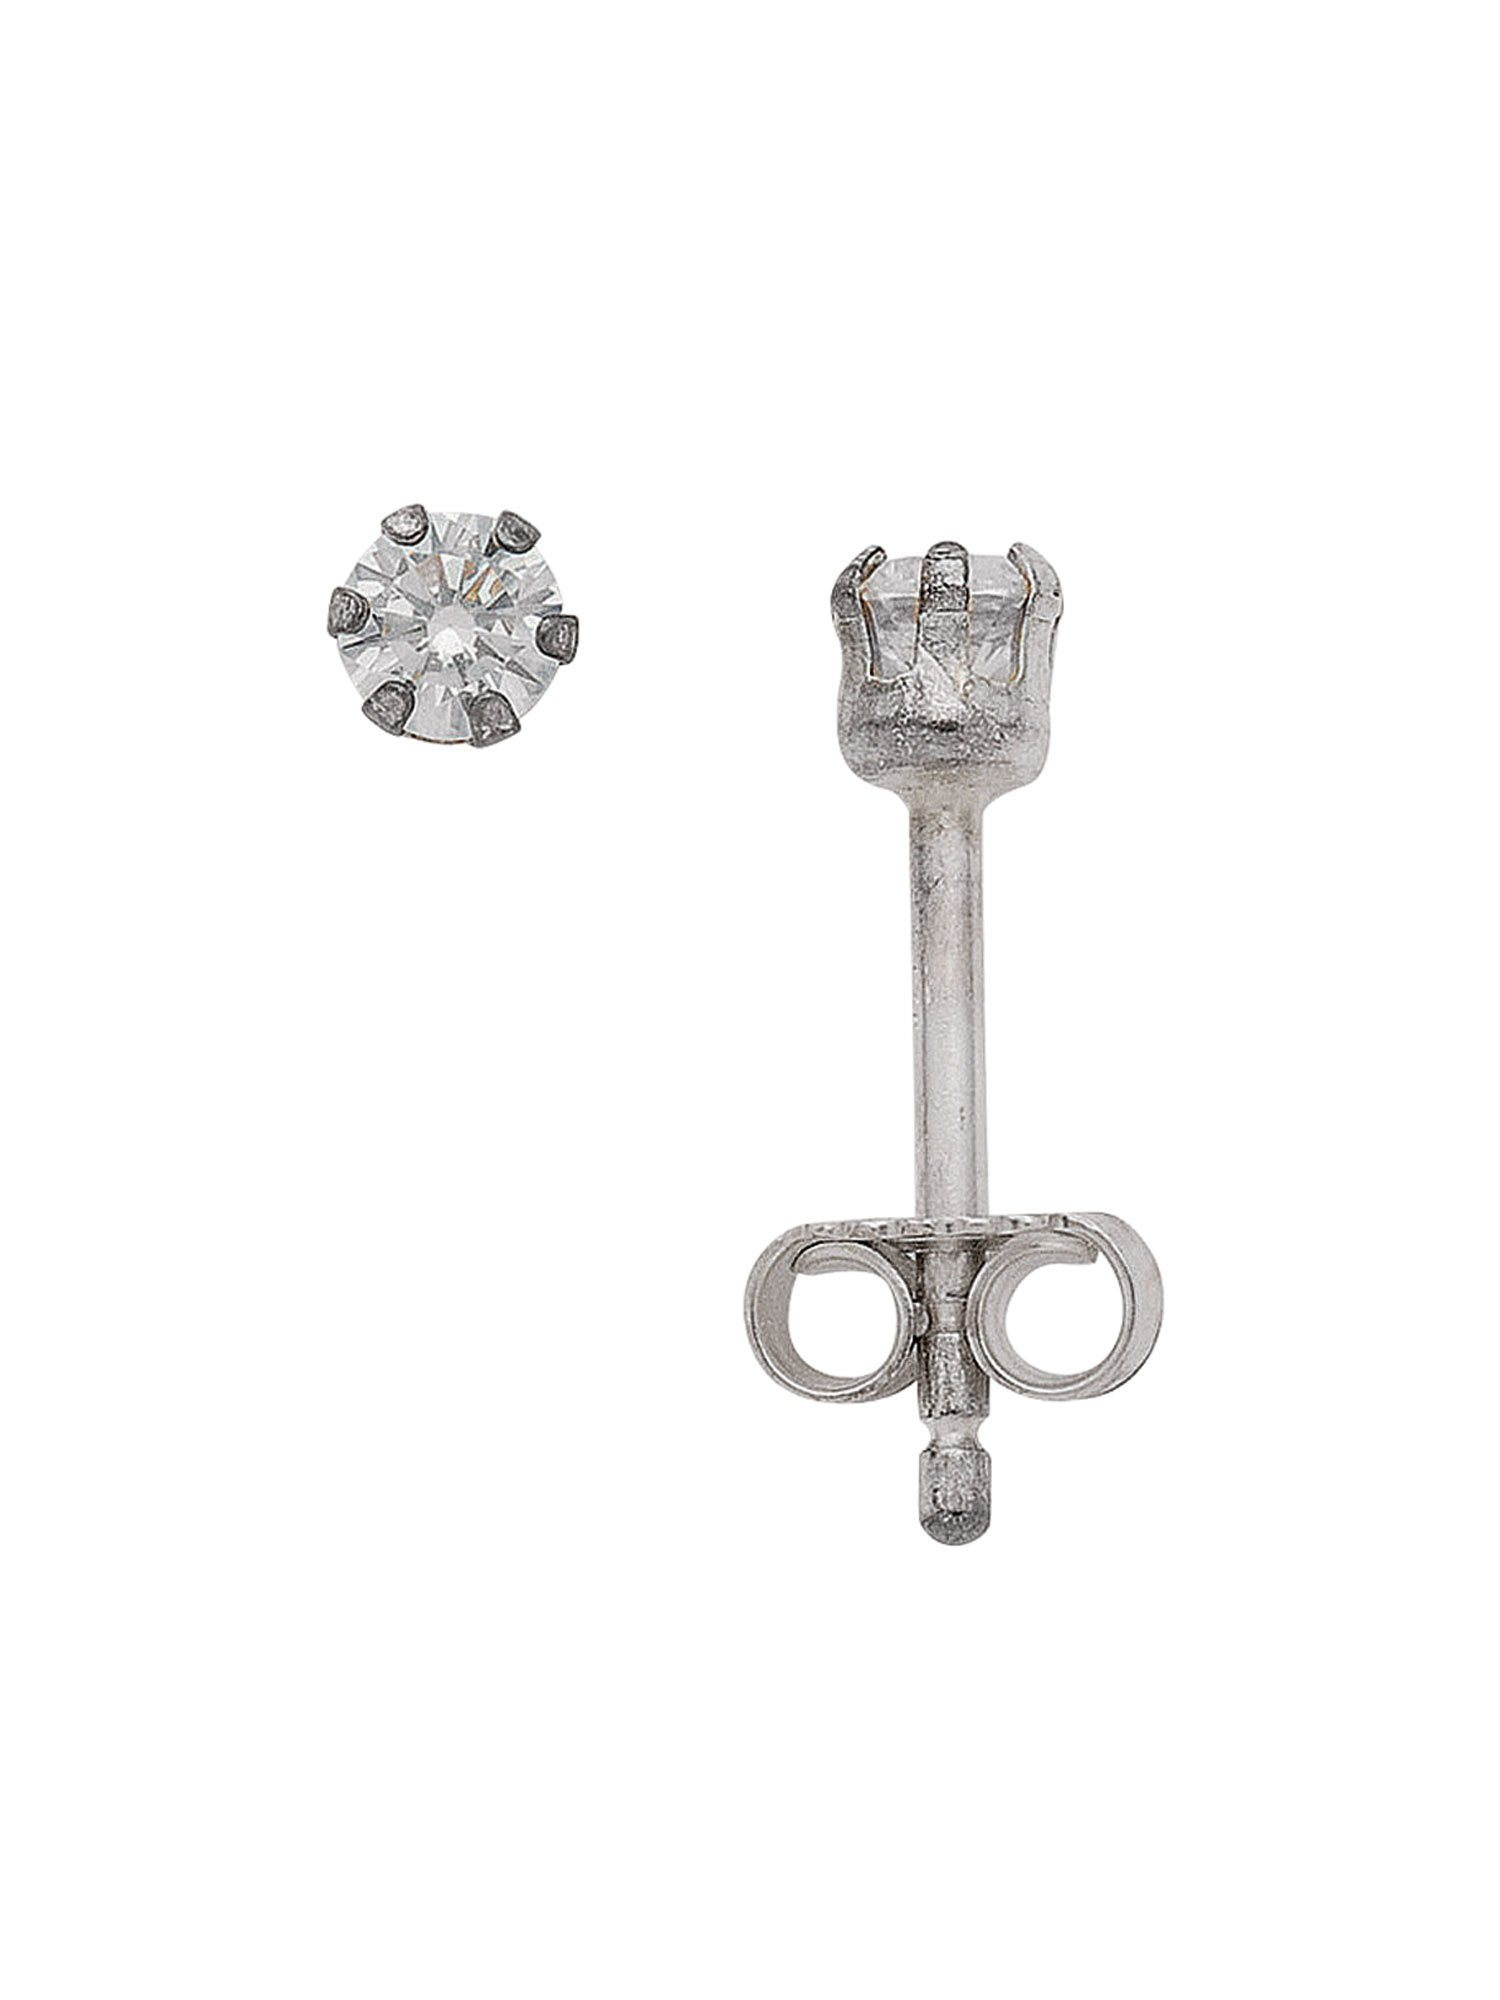 Adelia´s Paar Ohrstecker »Silber Ohrringe« 925 Sterling Silber mit Zirkonia Ø 3 mm | Schmuck > Ohrschmuck & Ohrringe > Ohrstecker | Silber | Adelia´s